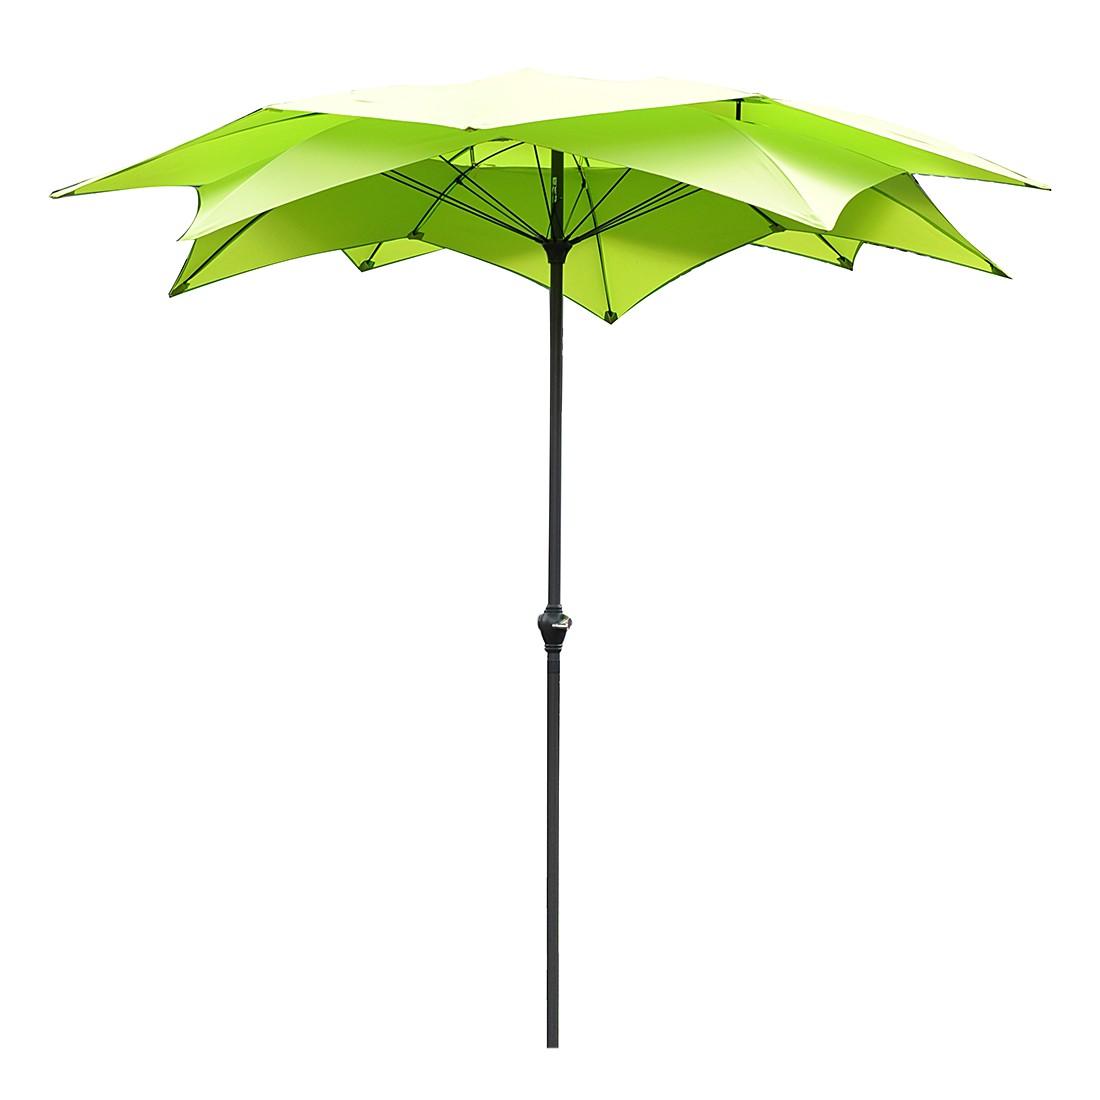 Sonnenschirm Blossom - Stahl/Polyester - Anthrazit/Grün, Leco